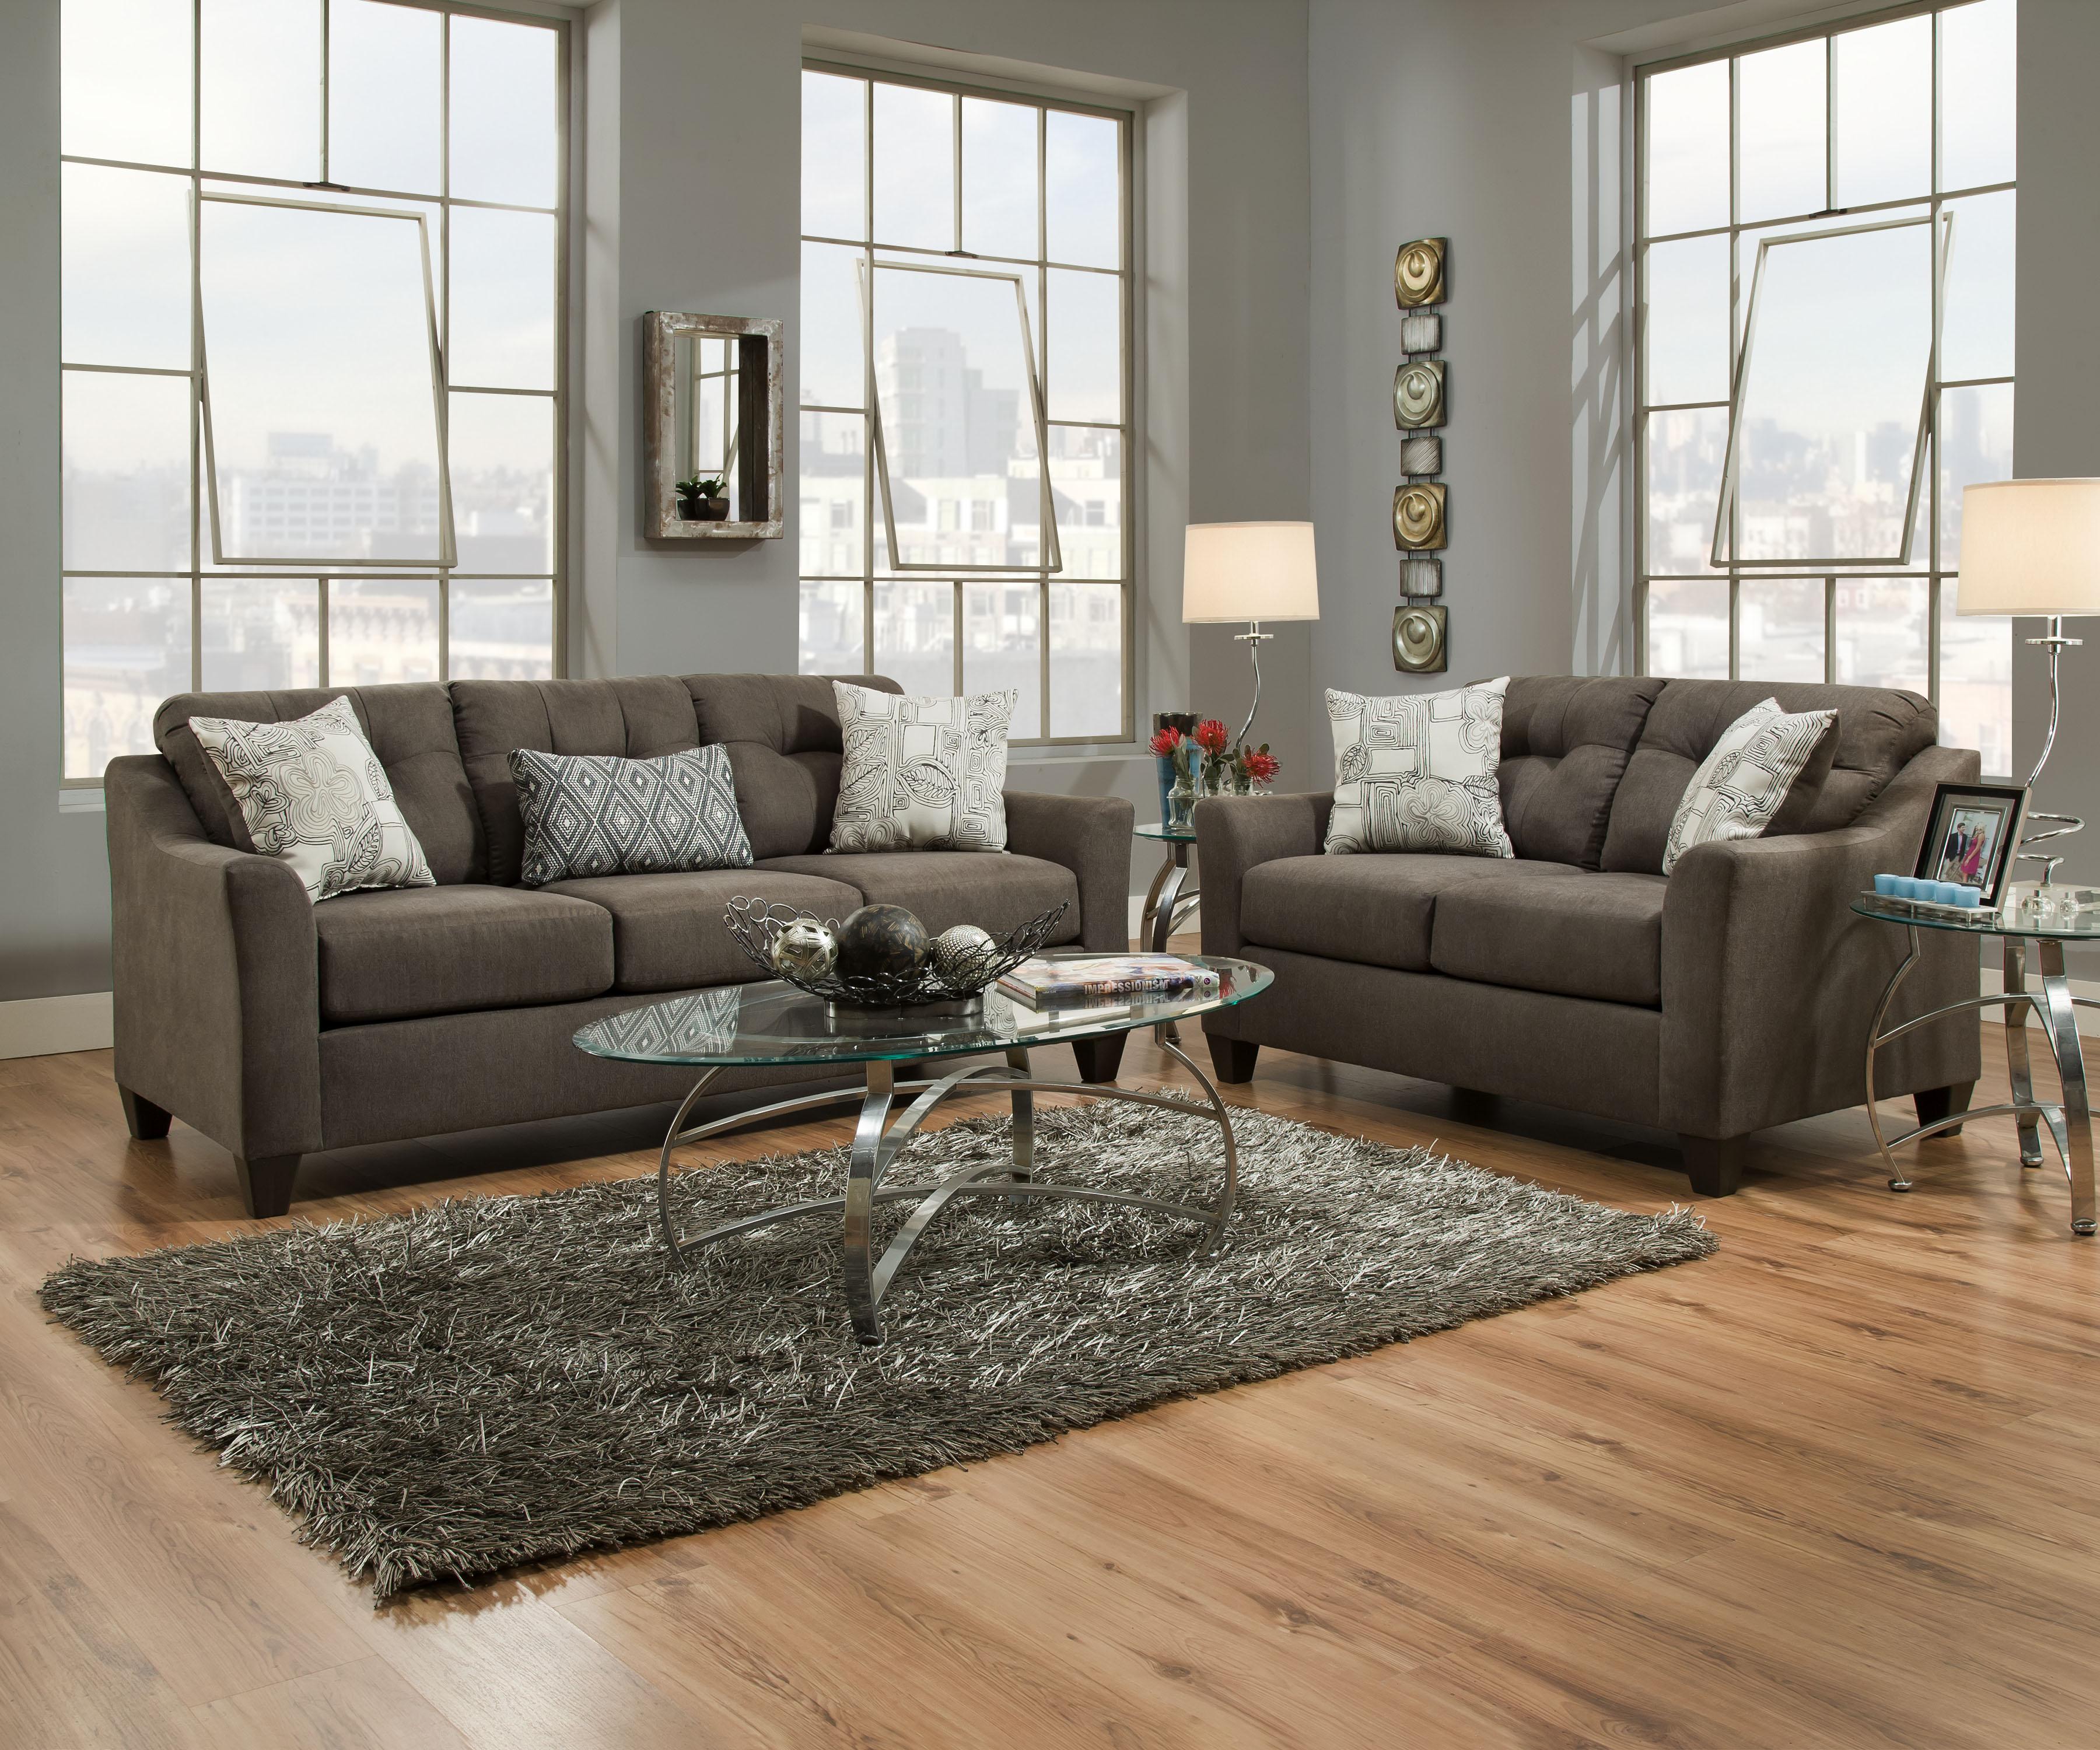 LSSIM4315 SIMMONS Sofa Reg $599 Now $399